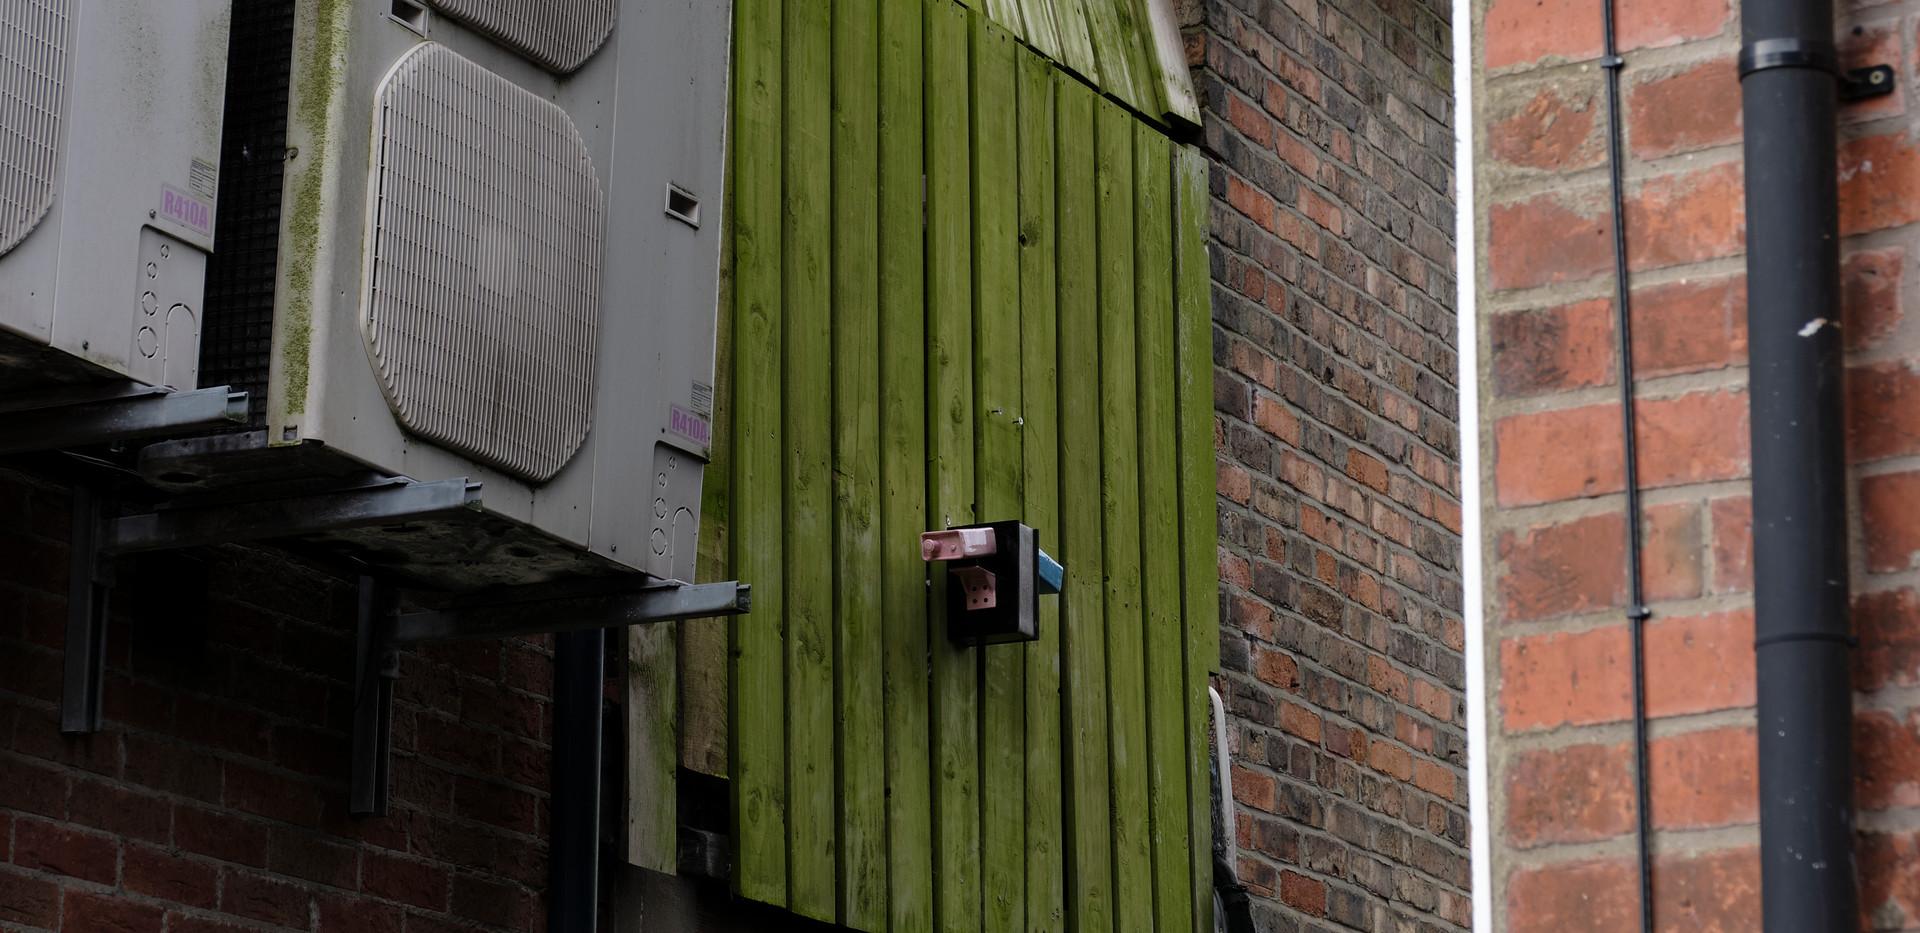 20210325 Limin Alley 076.jpg